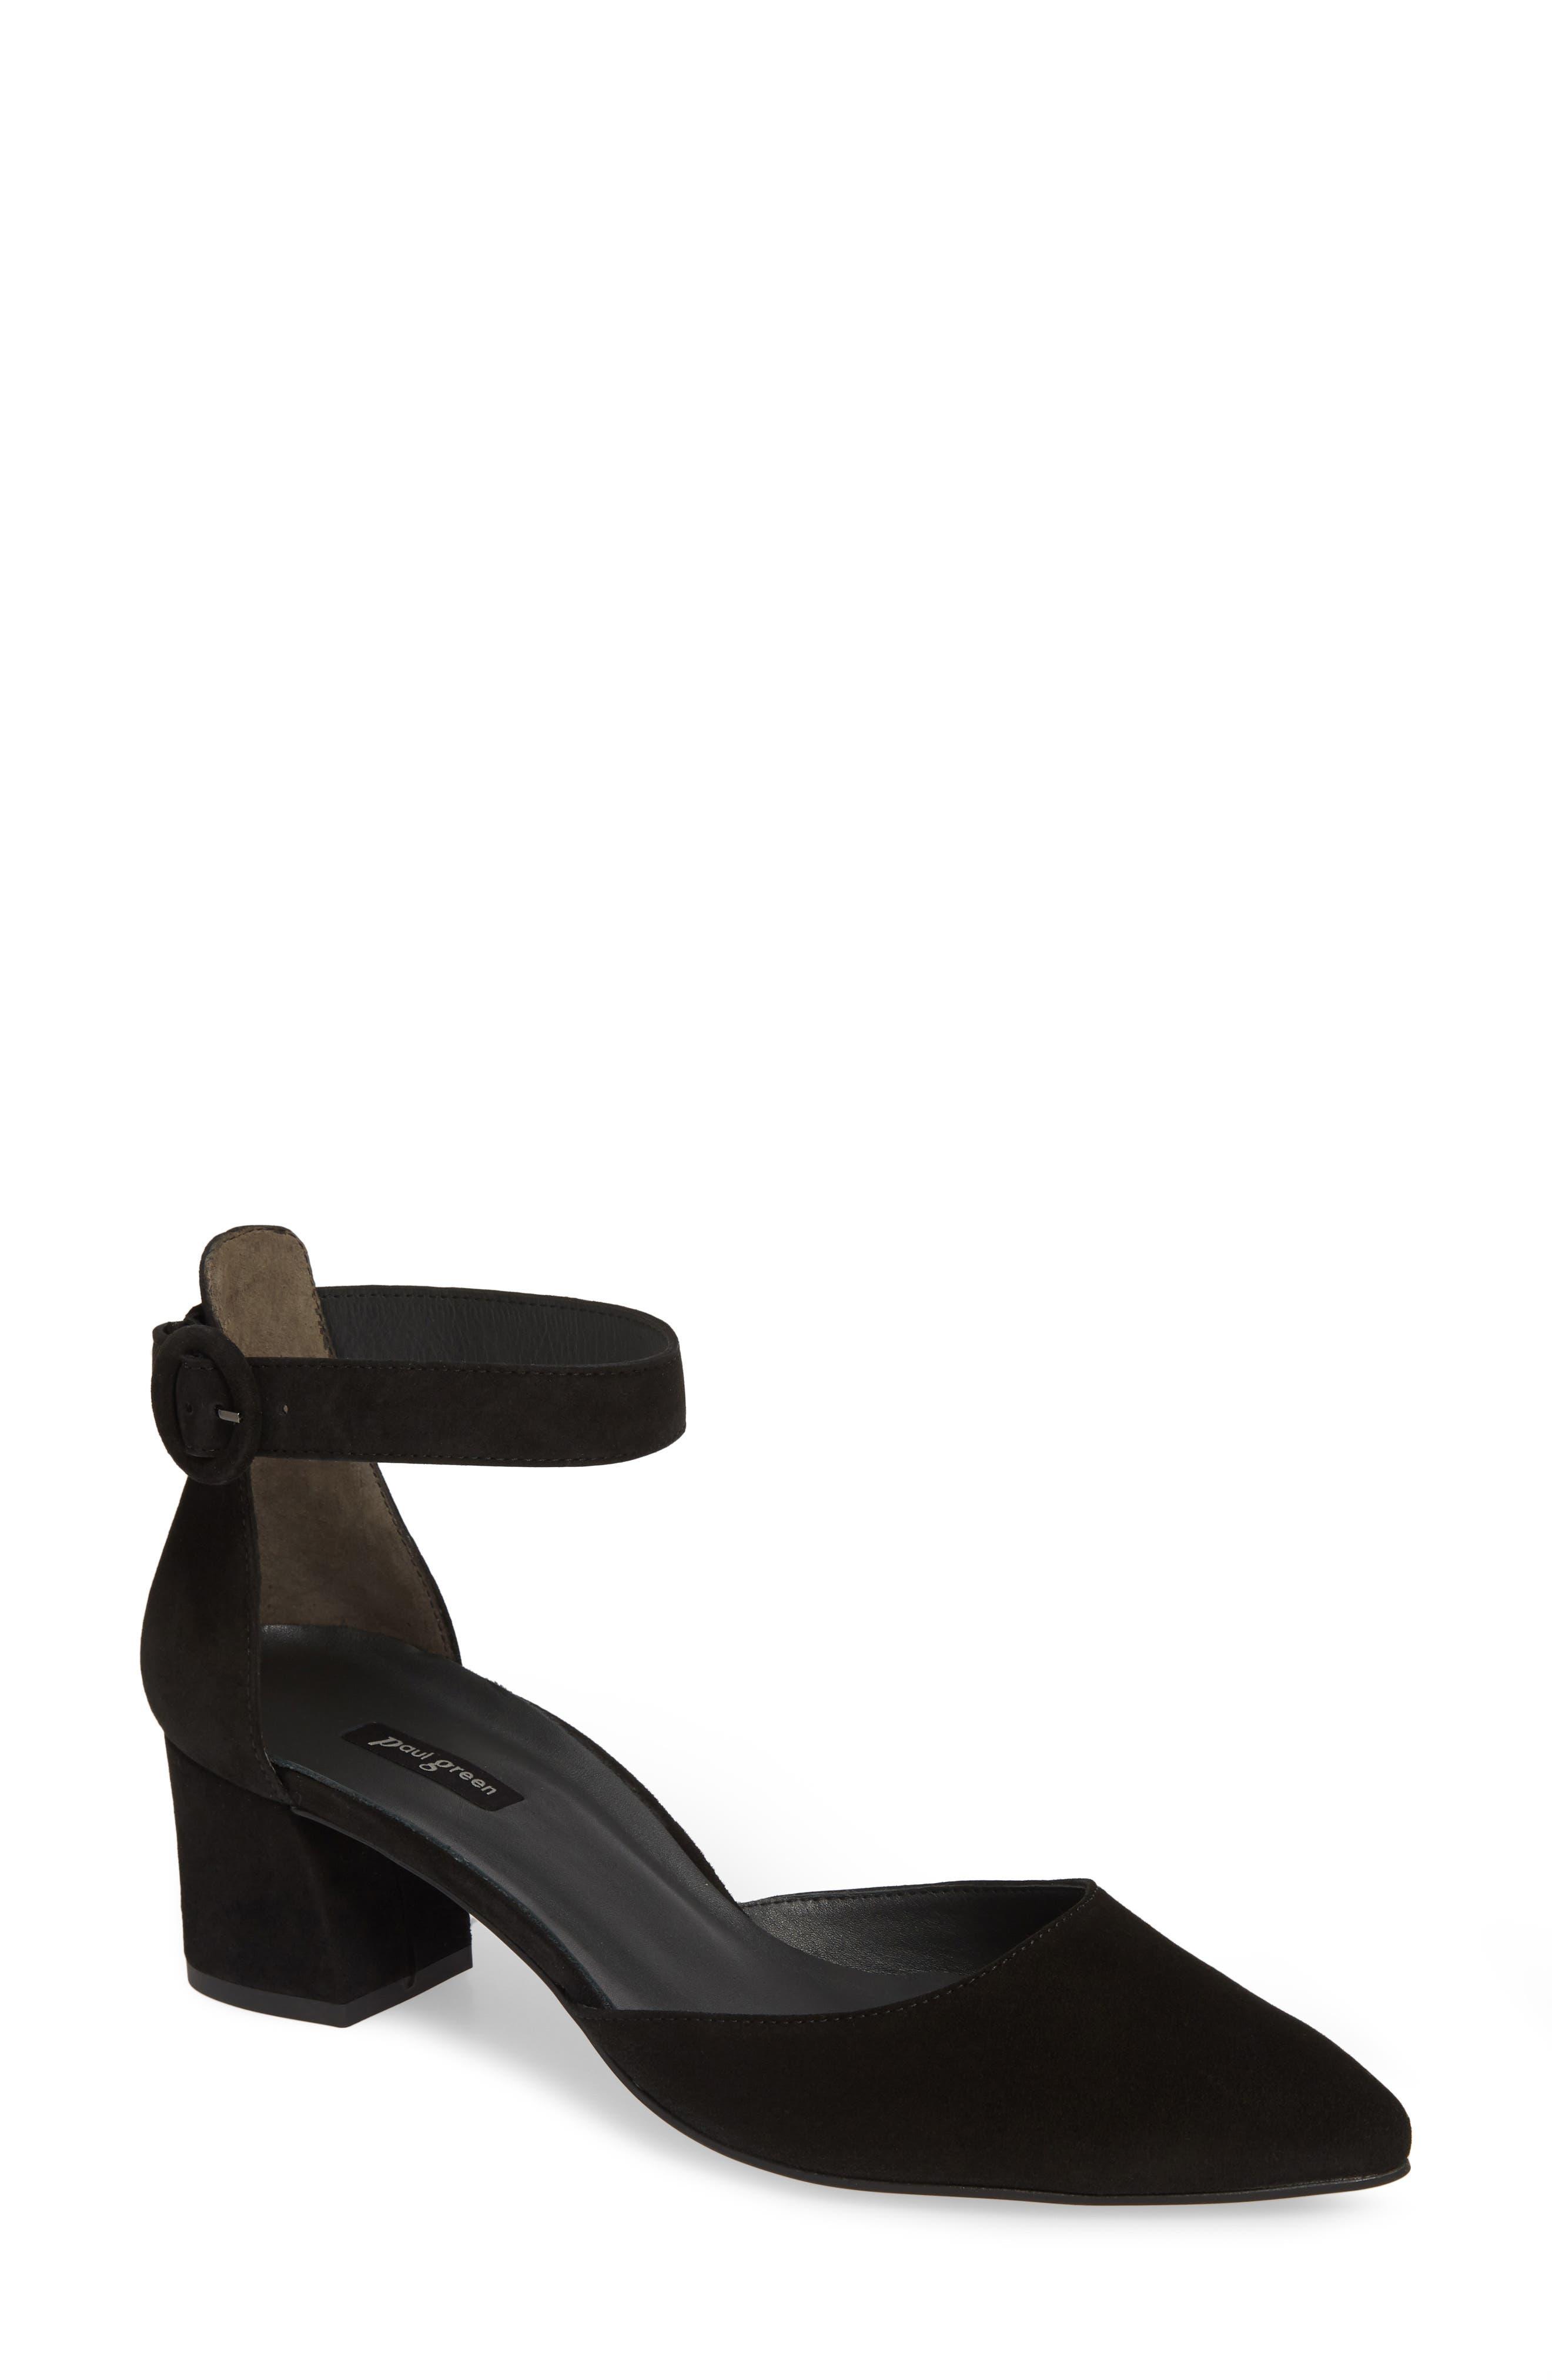 Paul Green Annie Ankle Strap Pump, US/ 5.5UK - Black